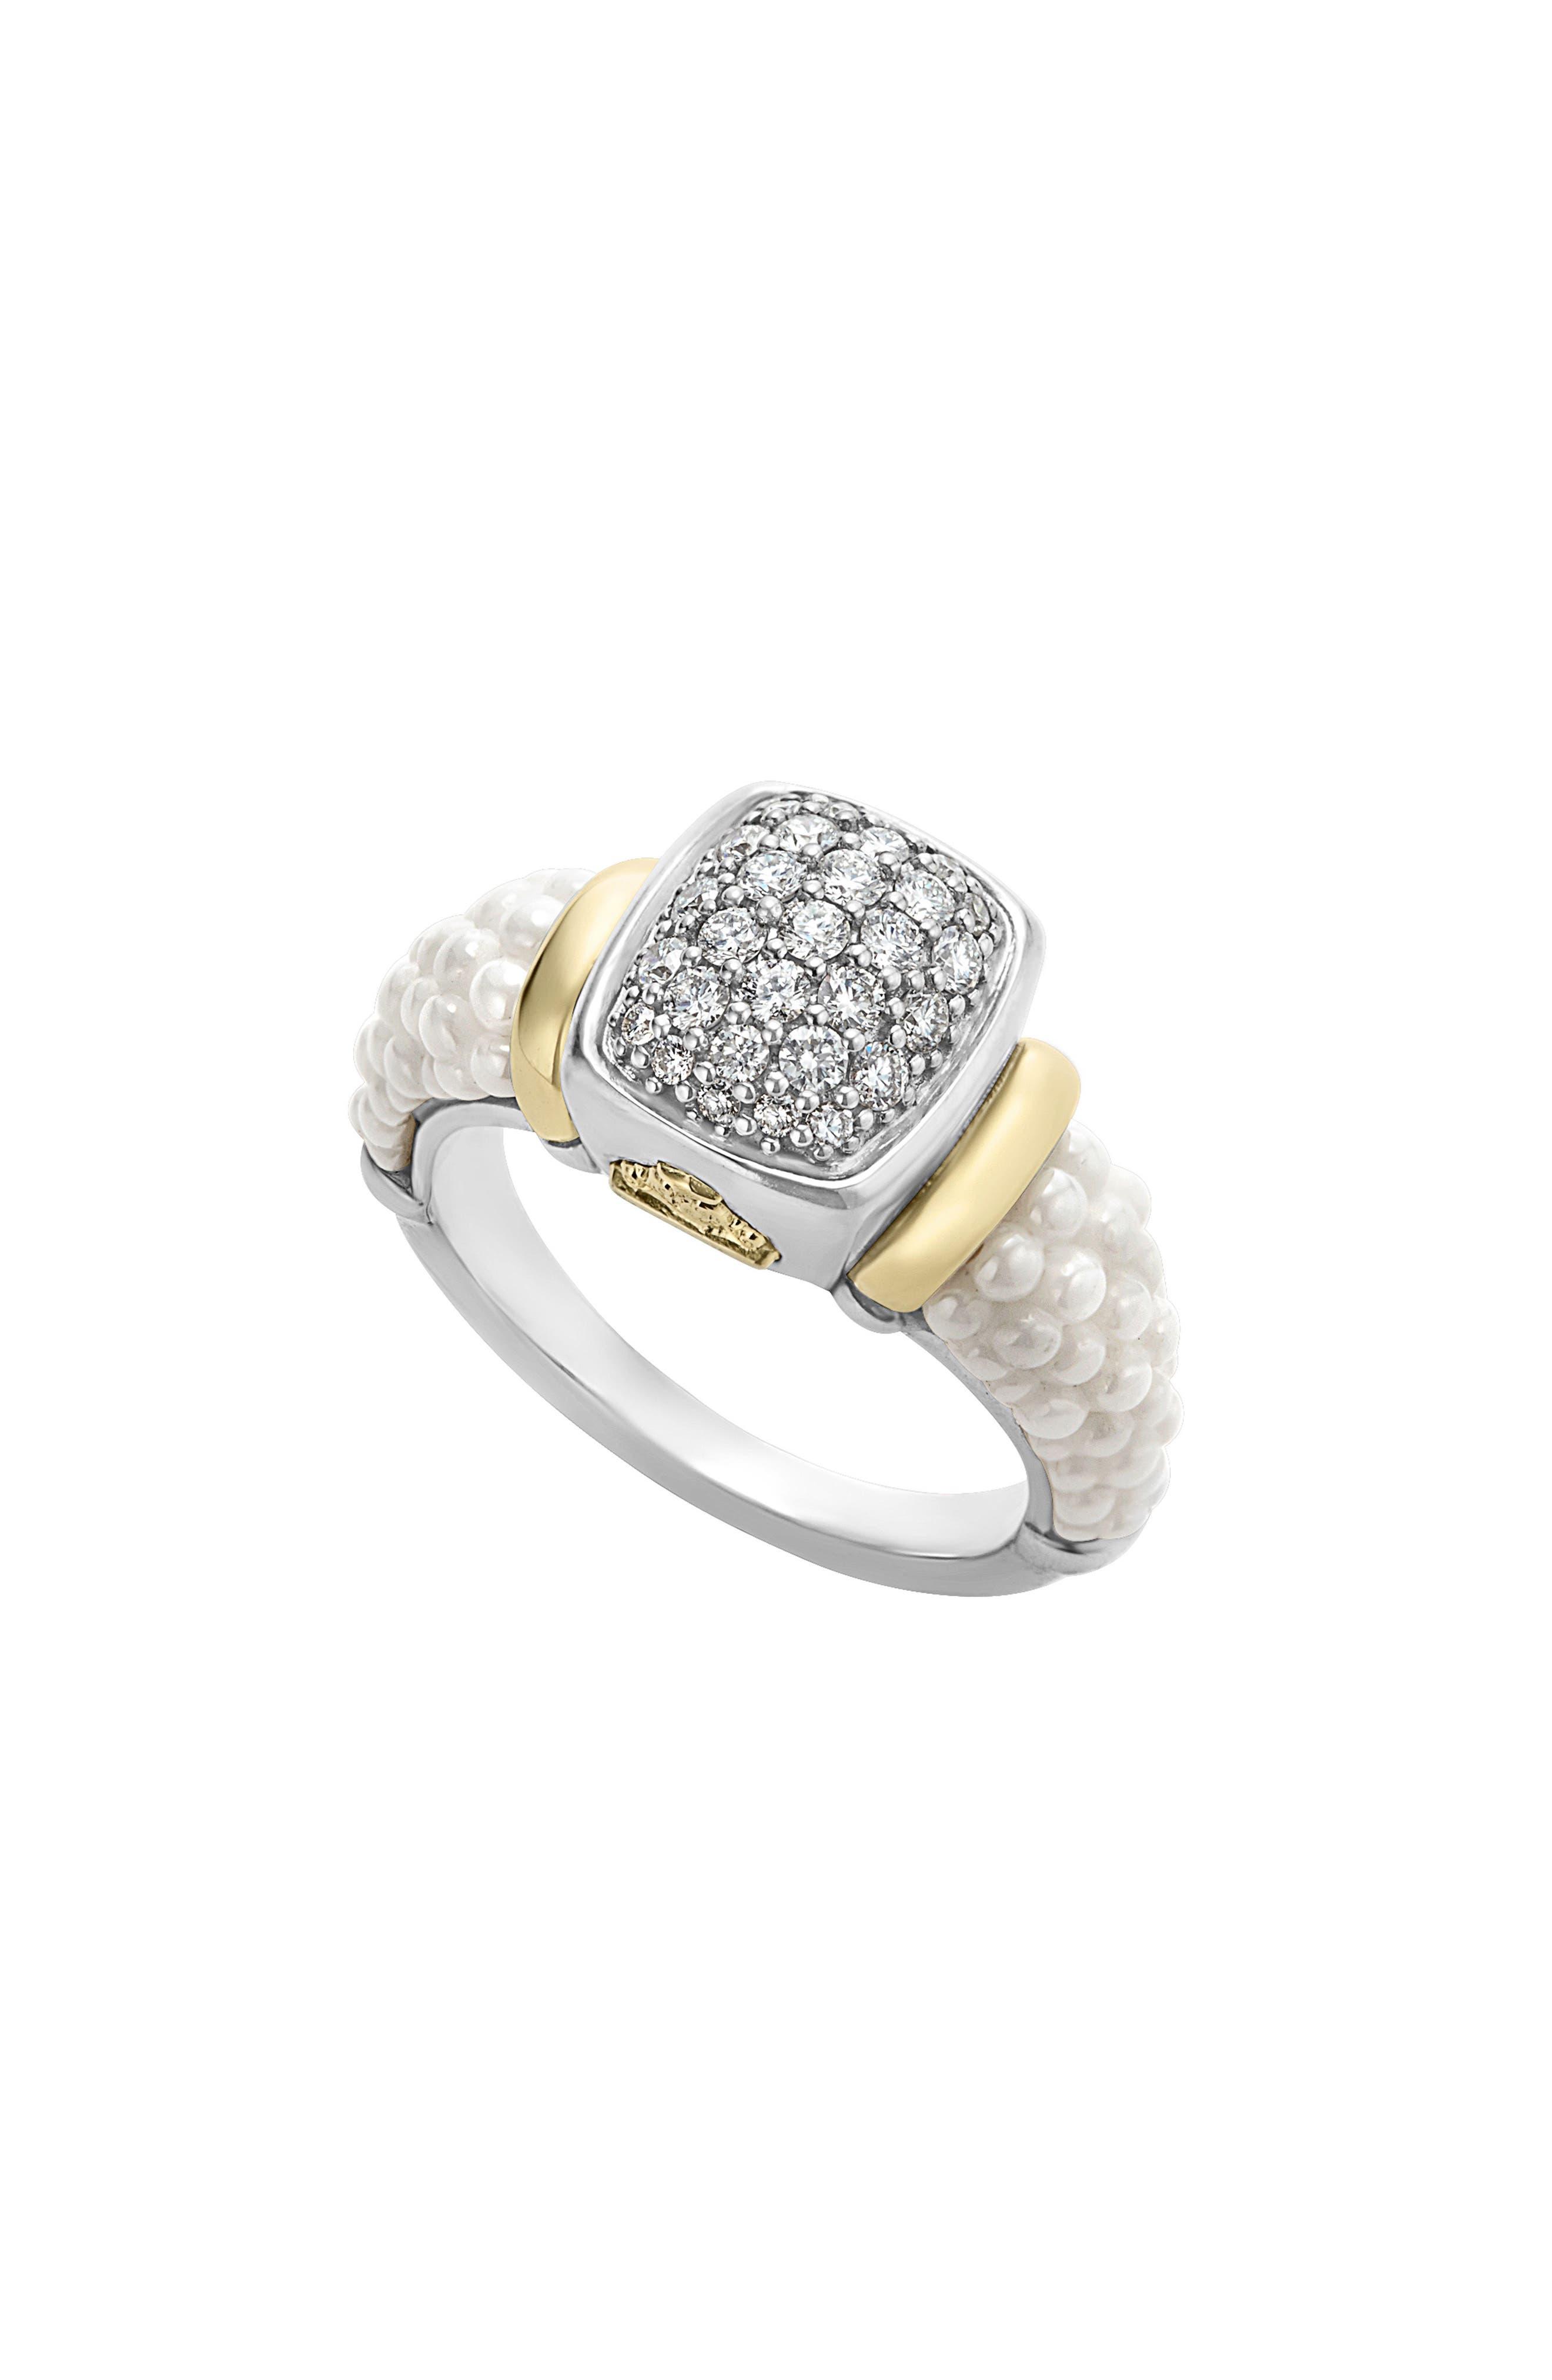 'Caviar' Diamond Ring,                         Main,                         color, White/ Gold